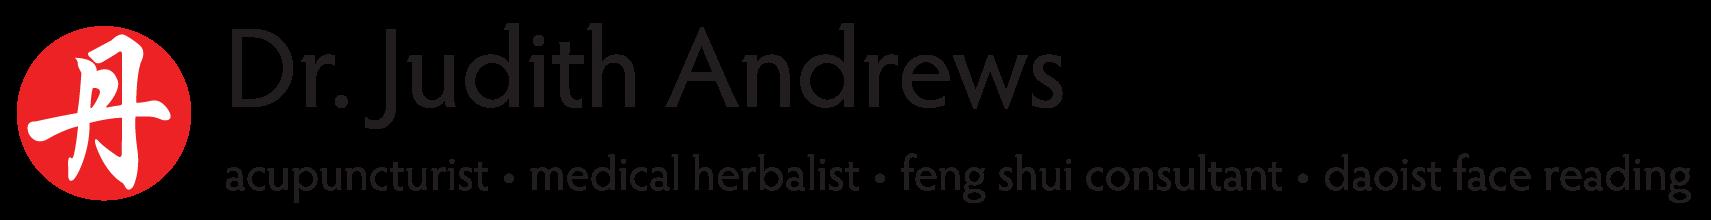 Dr. Judith Andrews Retina Logo